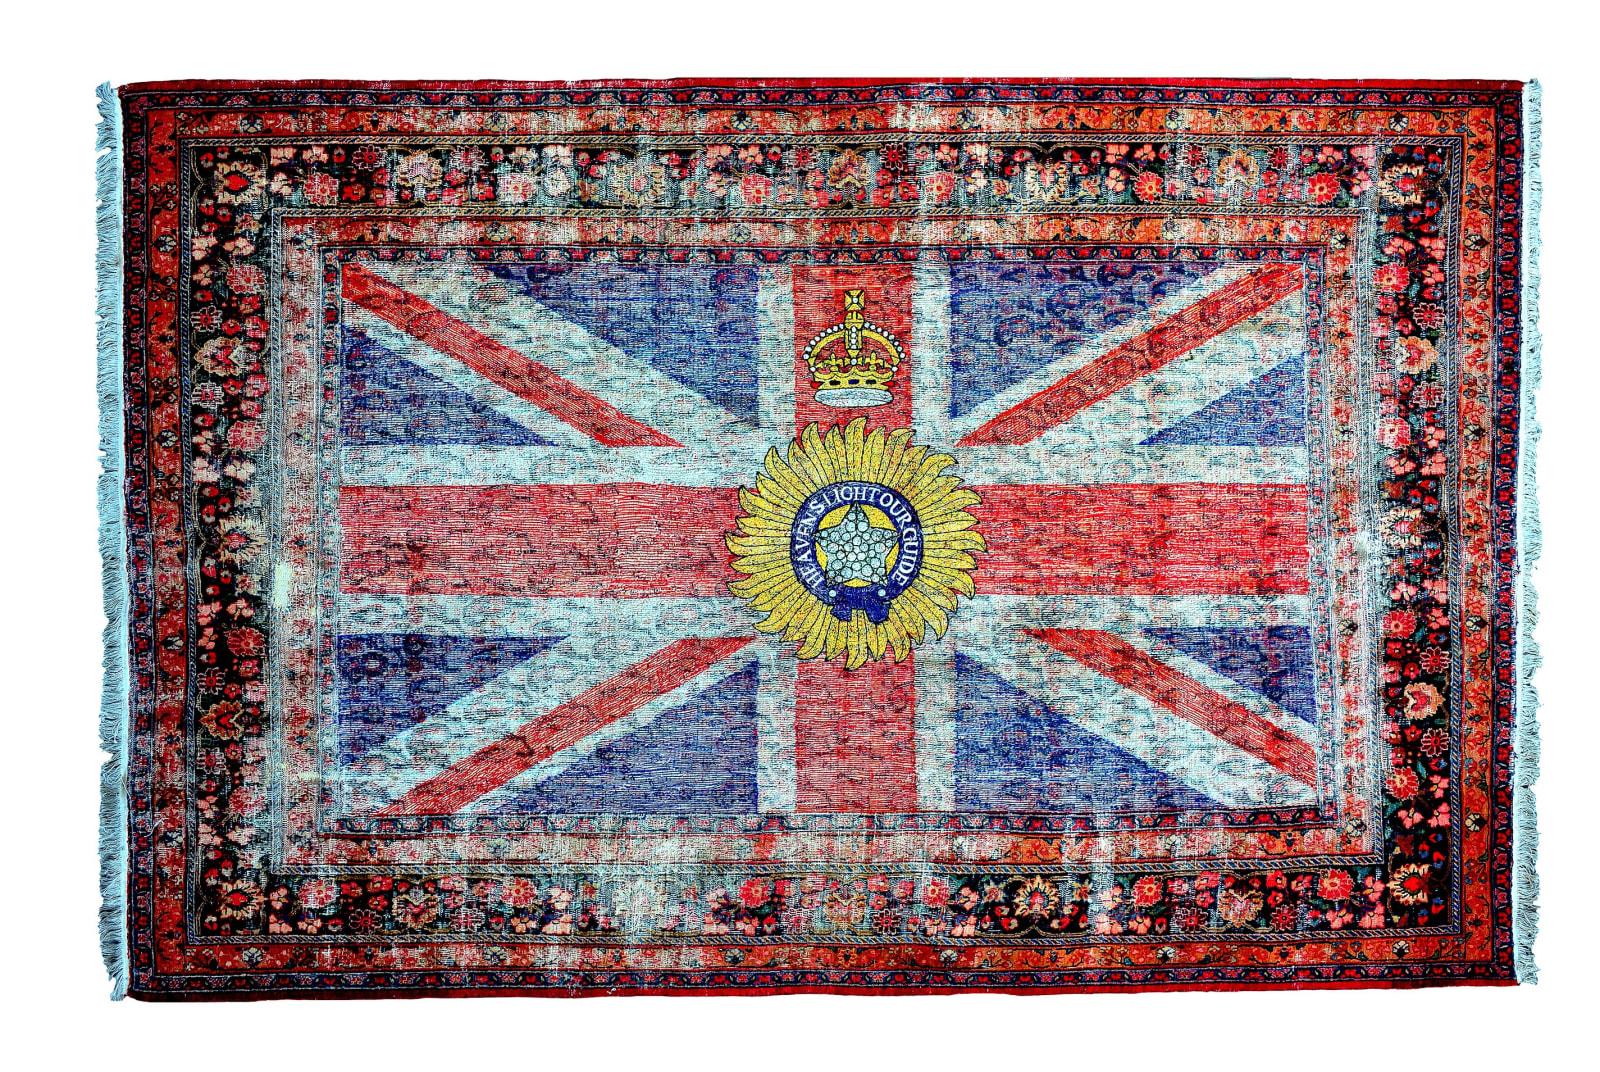 David Alesworth, Viceroy's Flag 1885, 2012